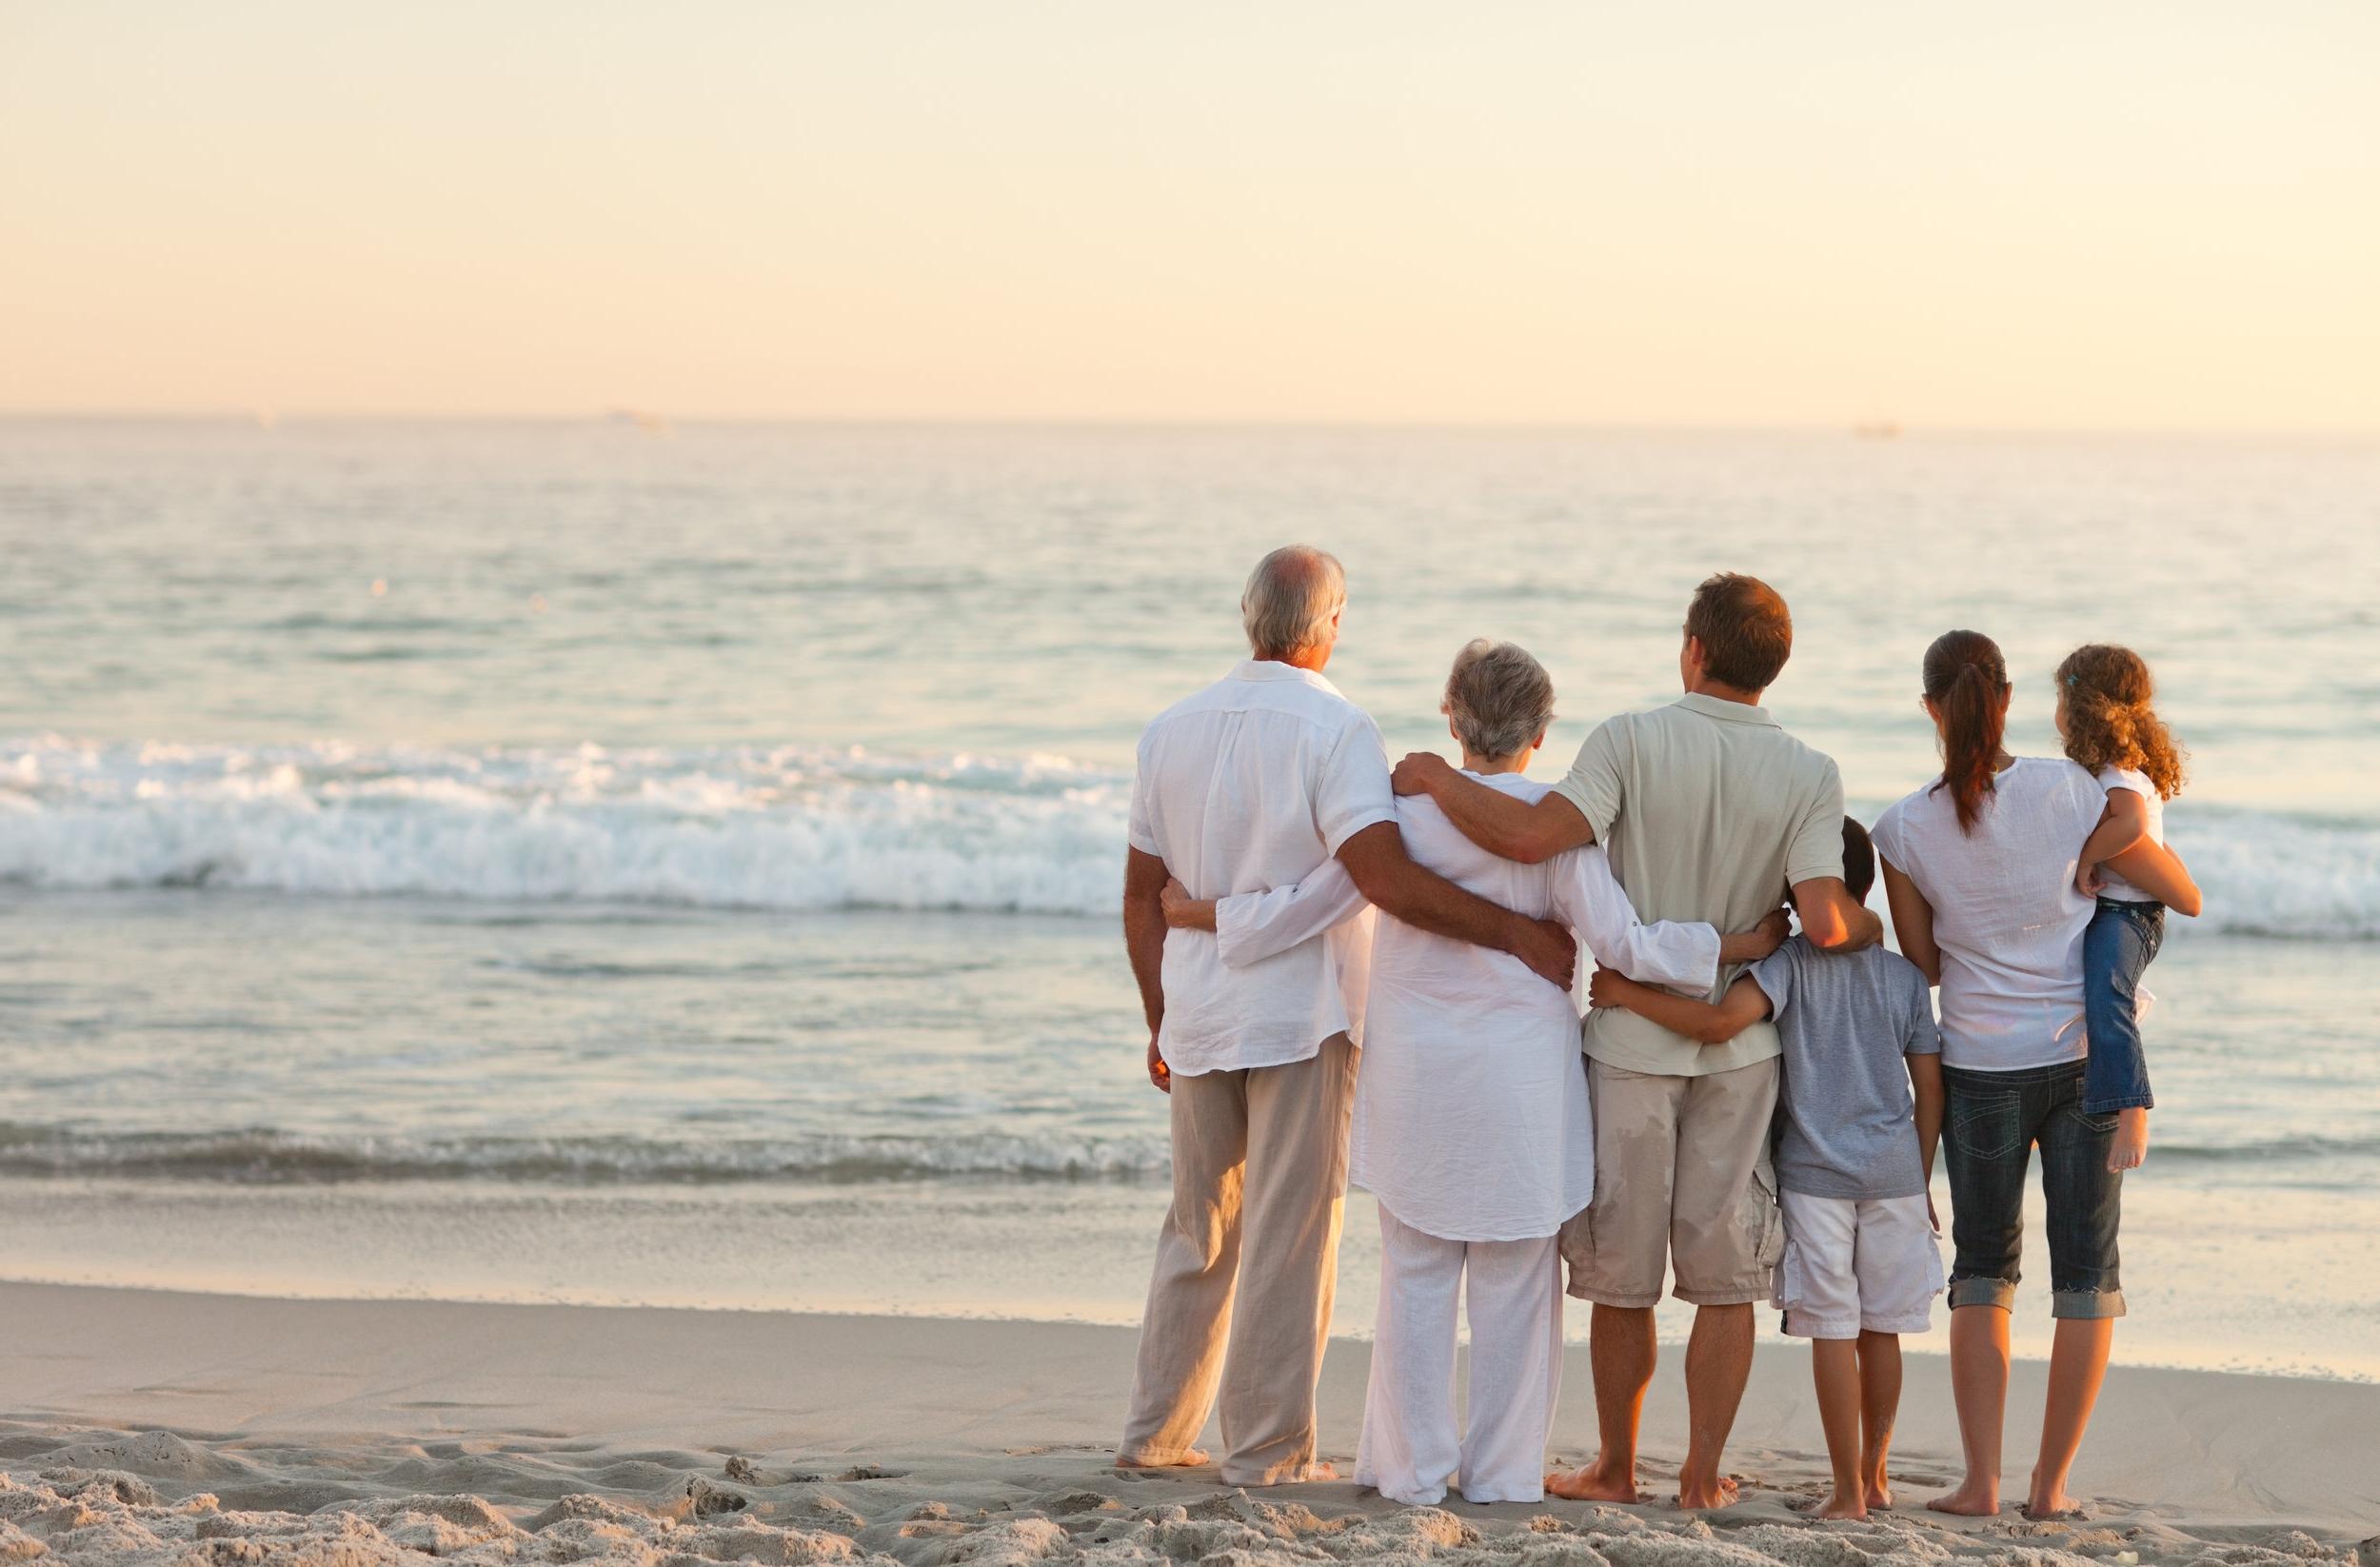 Destin, FL & Miramar Beach, FL Financial Planner & Financial Advisor